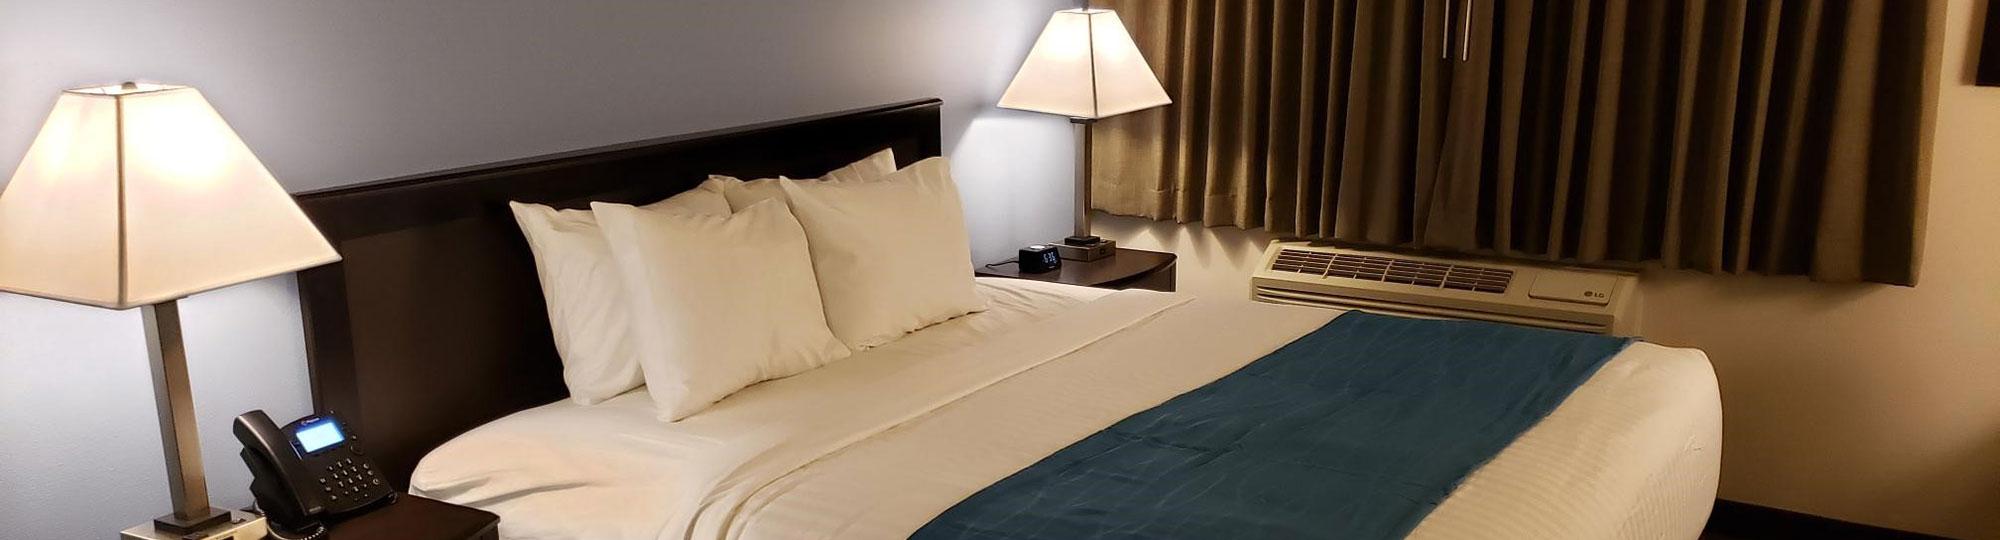 Cobblestone Inn & Suites Manchester